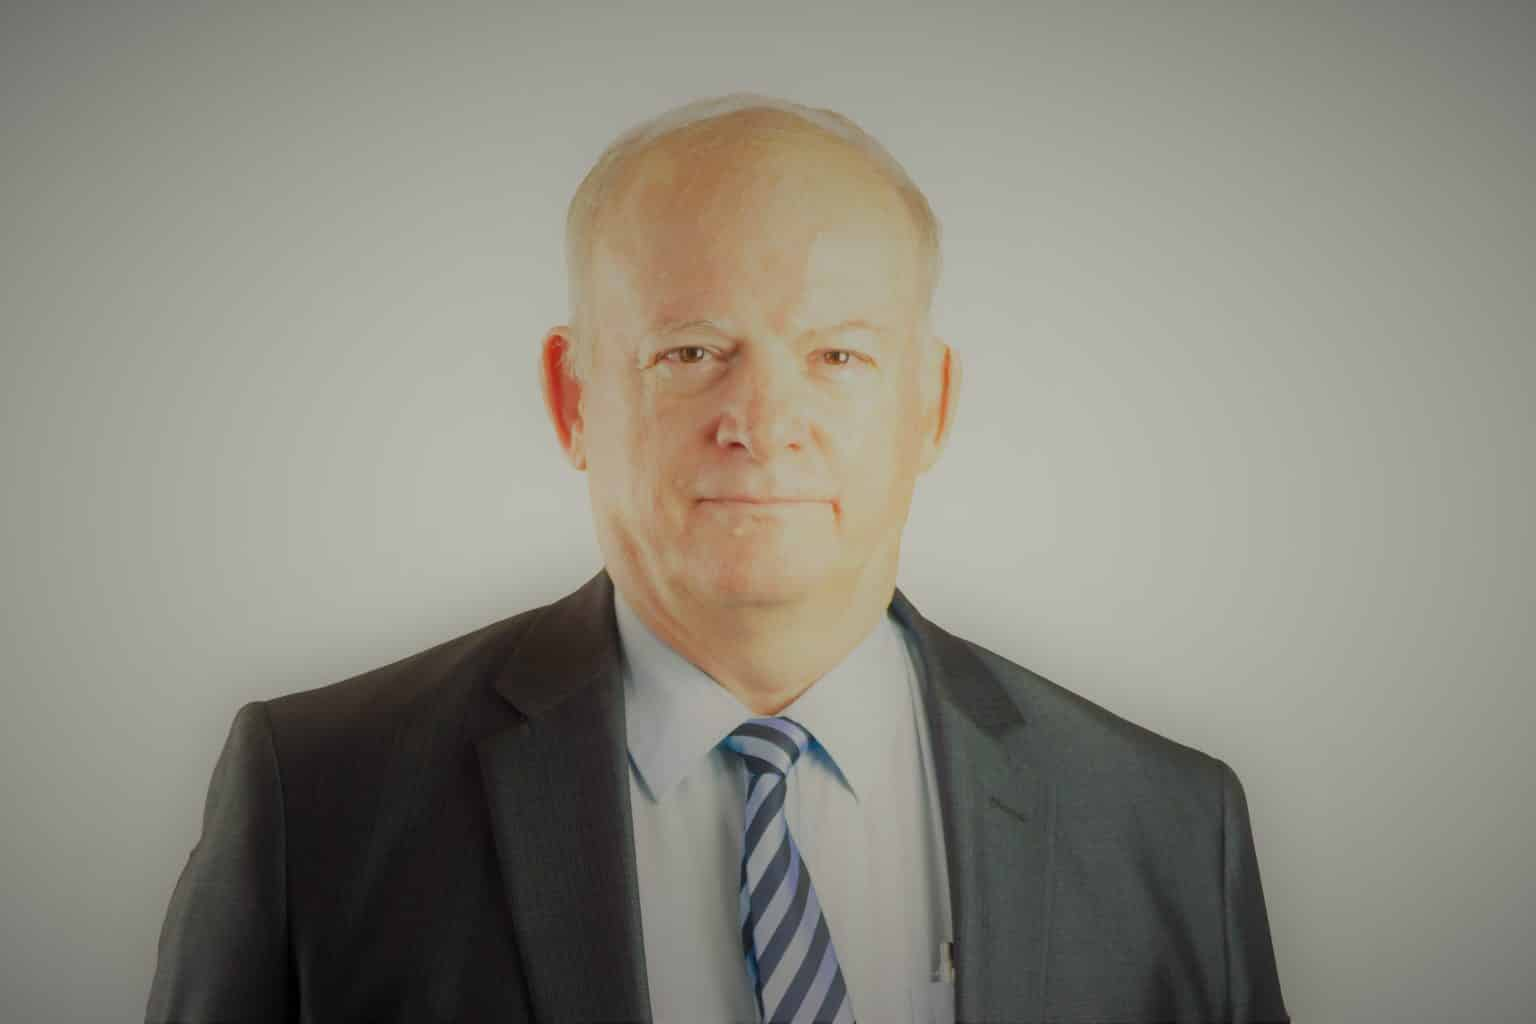 https://www.alflawyers.com.au/wp-content/uploads/2020/07/ALF-Tony-1-1536x1024-1.jpg